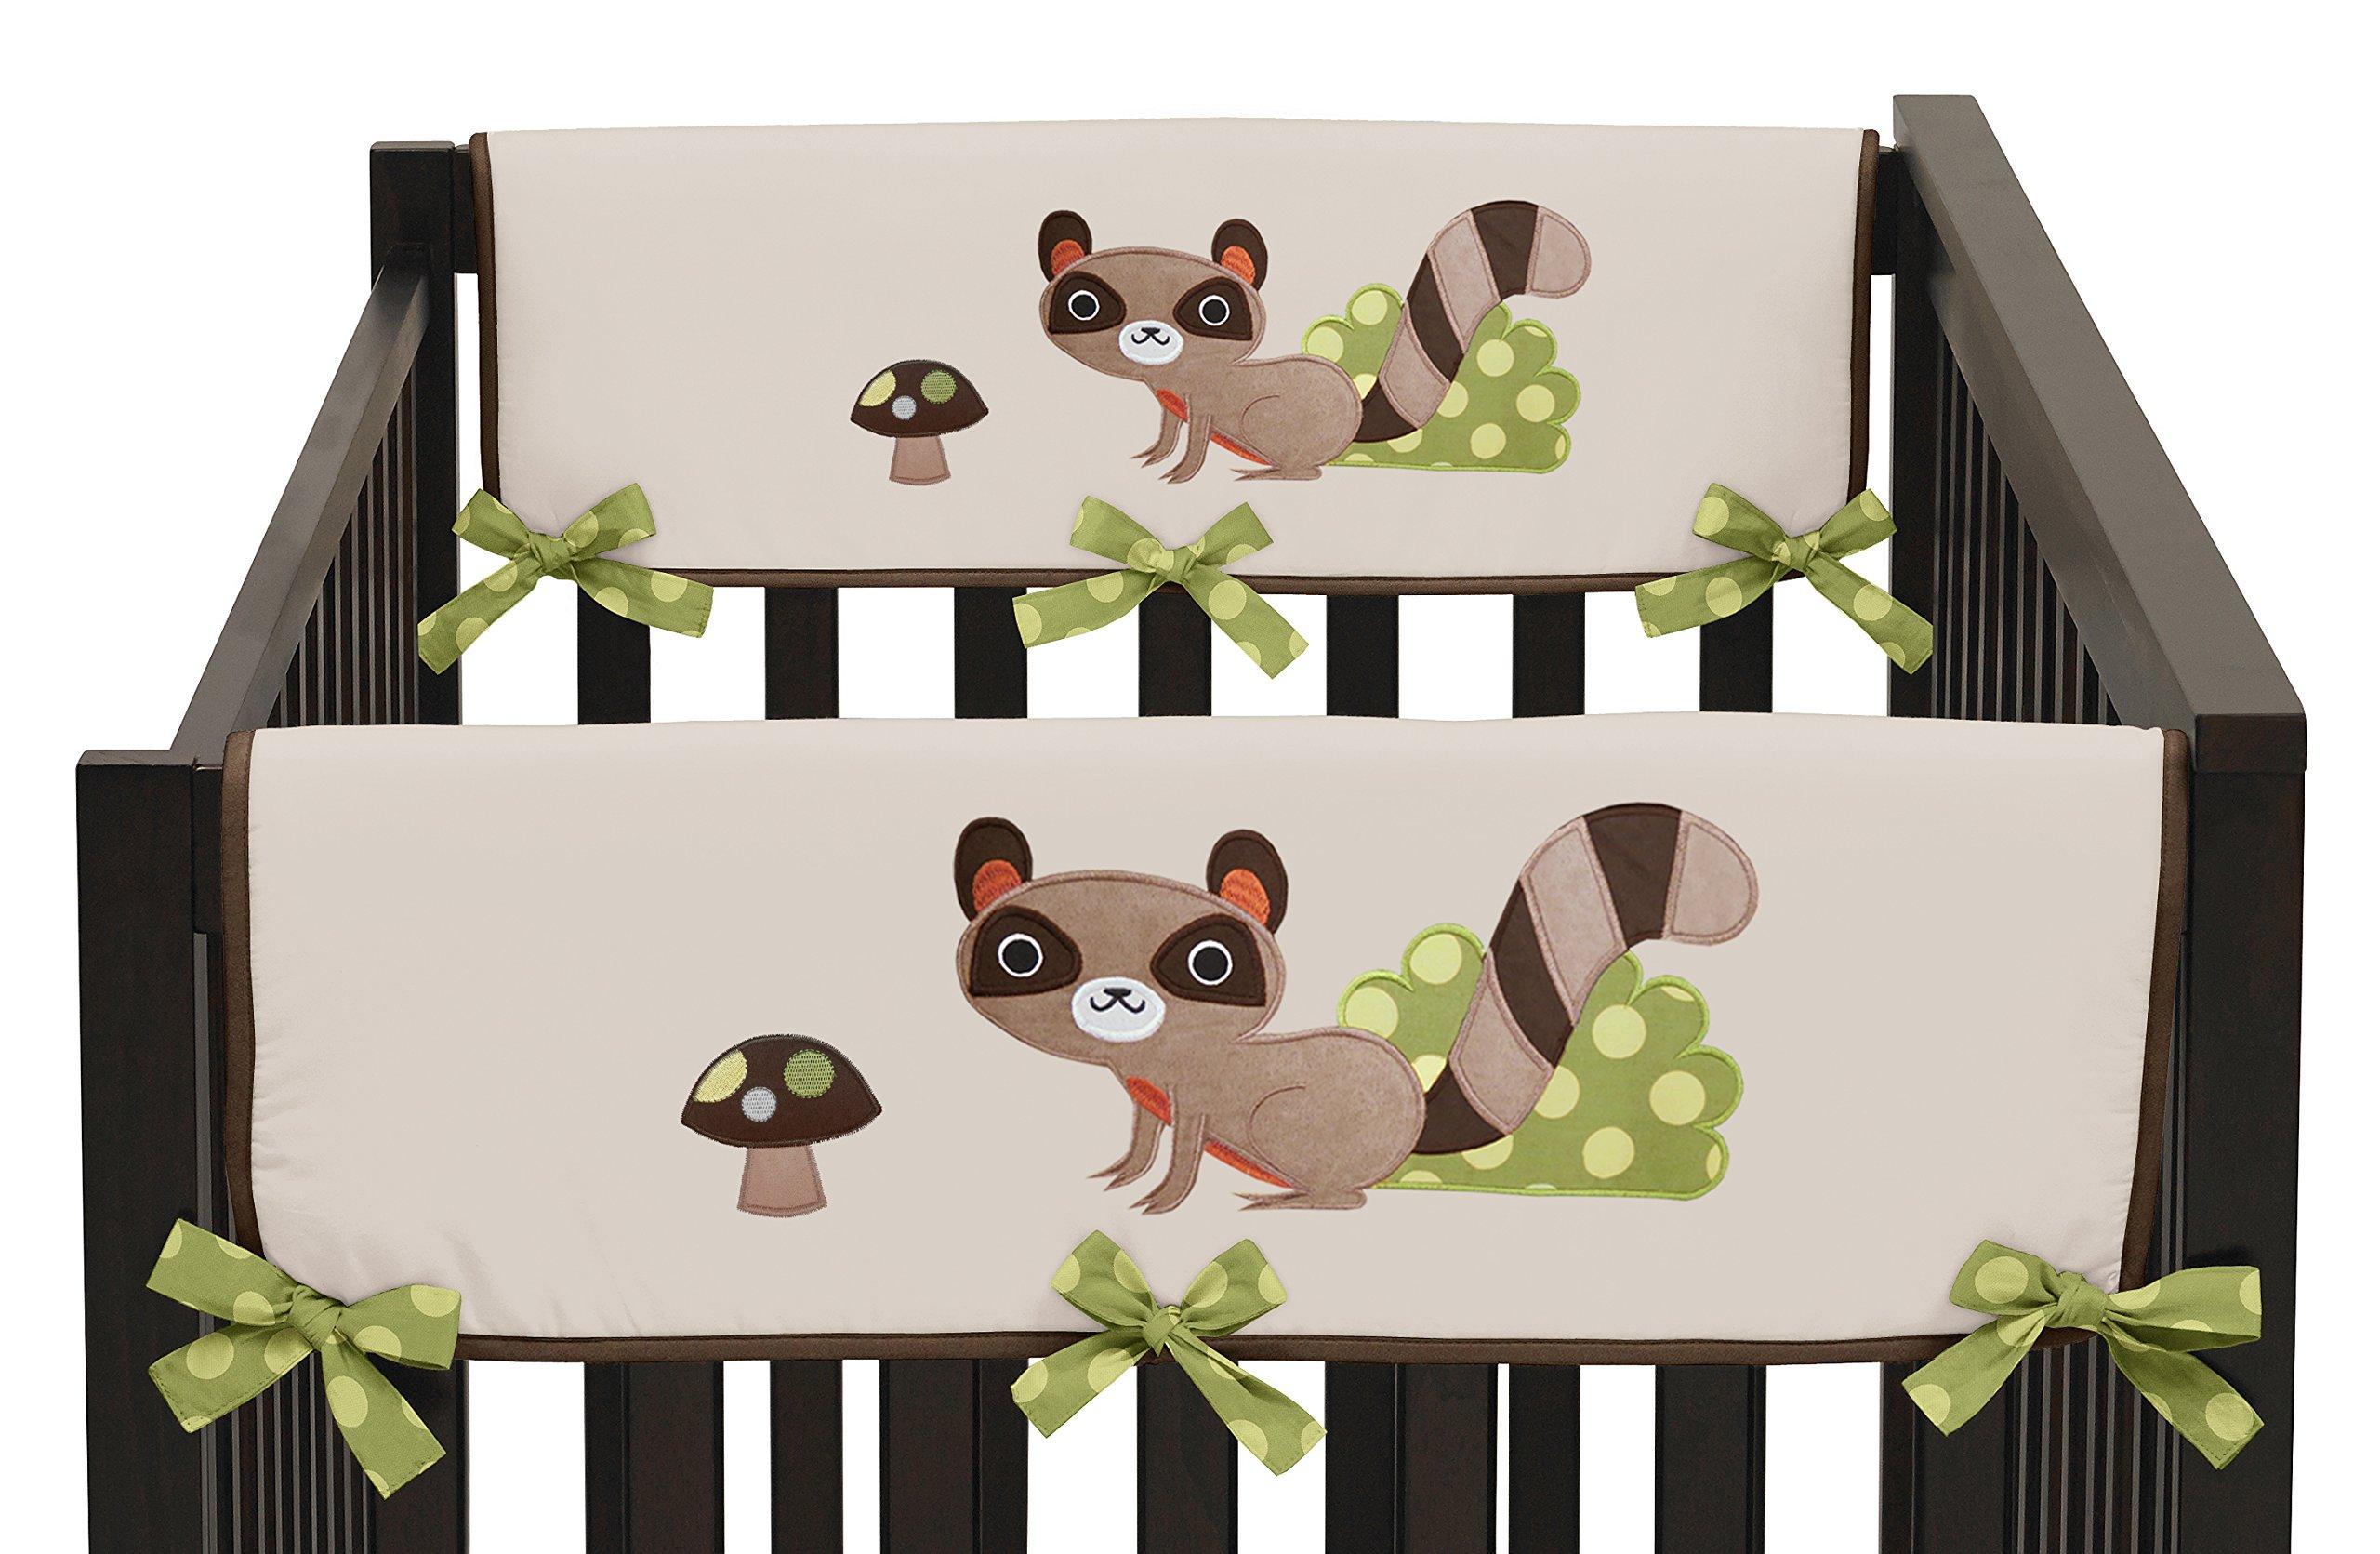 Sweet Jojo Designs 2-Piece Forest Friends Teething Protector Cover Wrap Baby Boy Crib Side Rail Guards by Sweet Jojo Designs